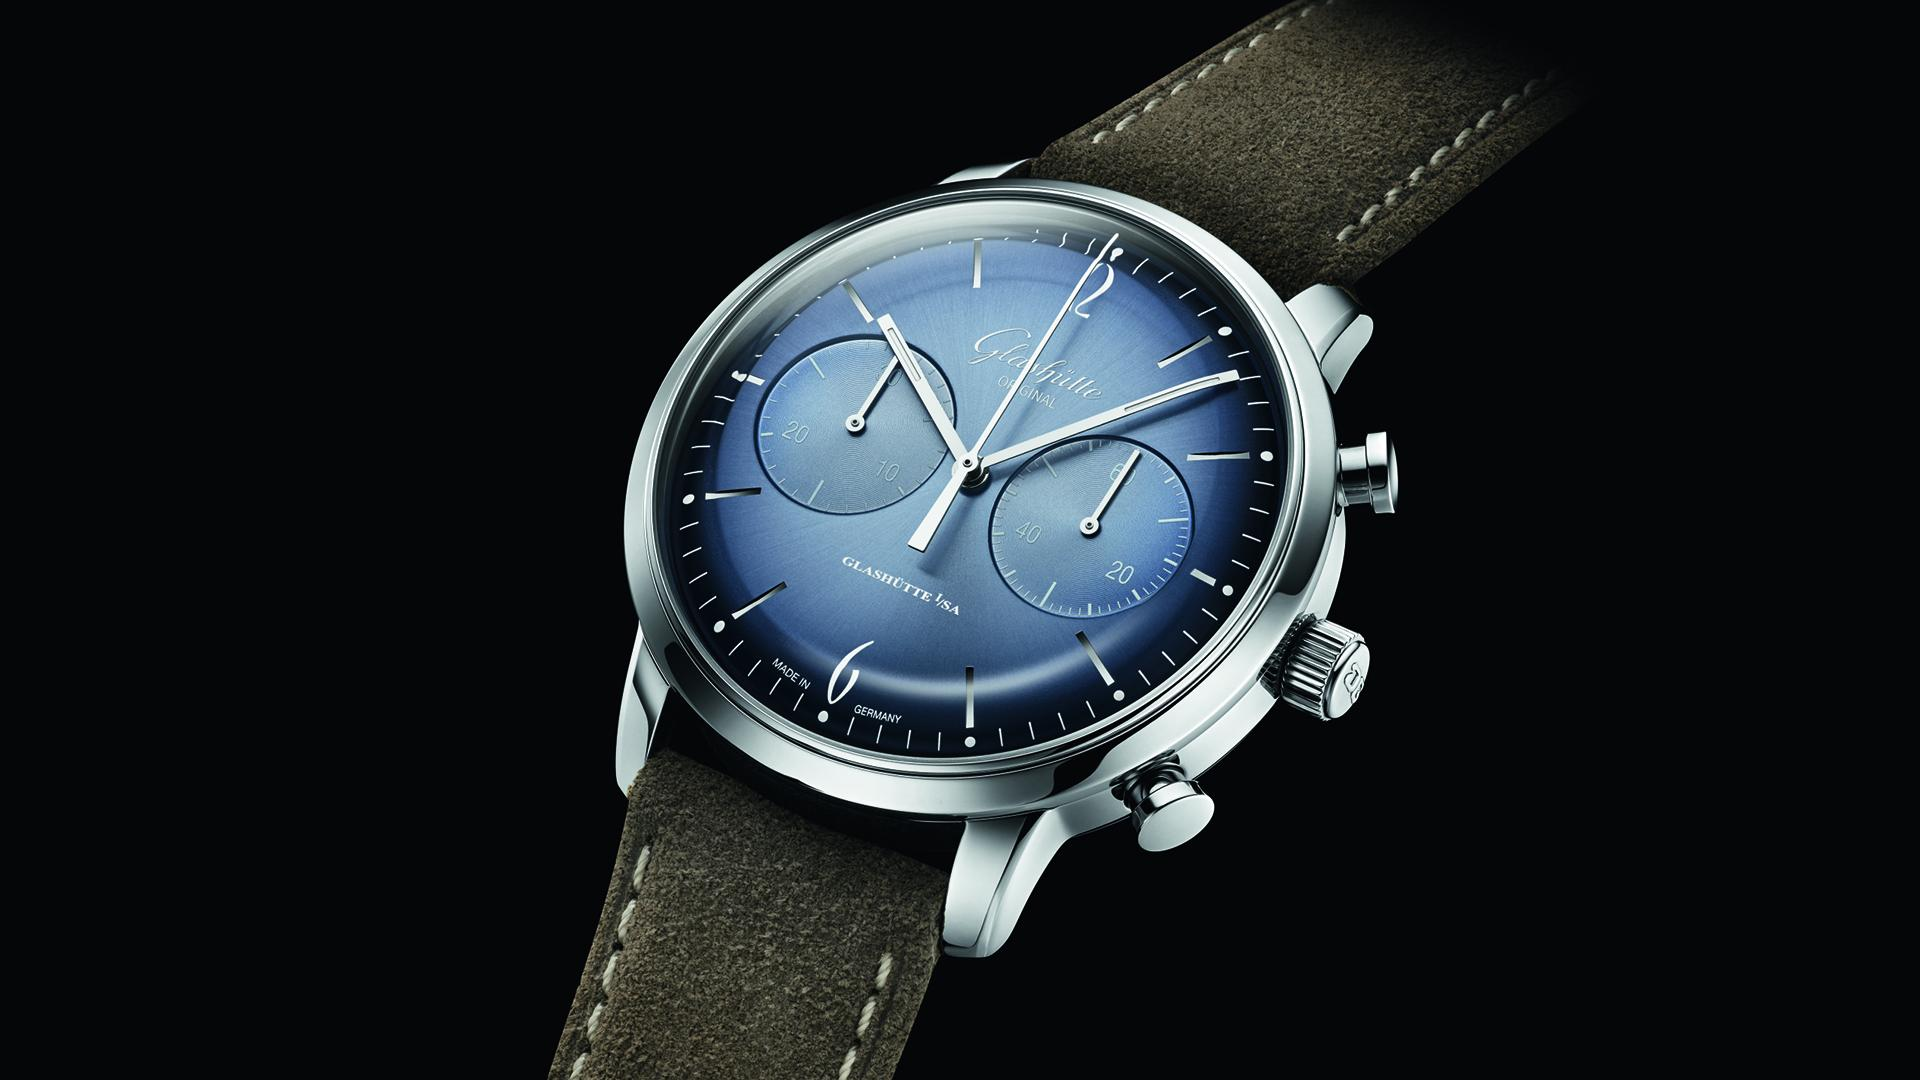 Glashütte Original Sixties Edition Glacier Blue watch